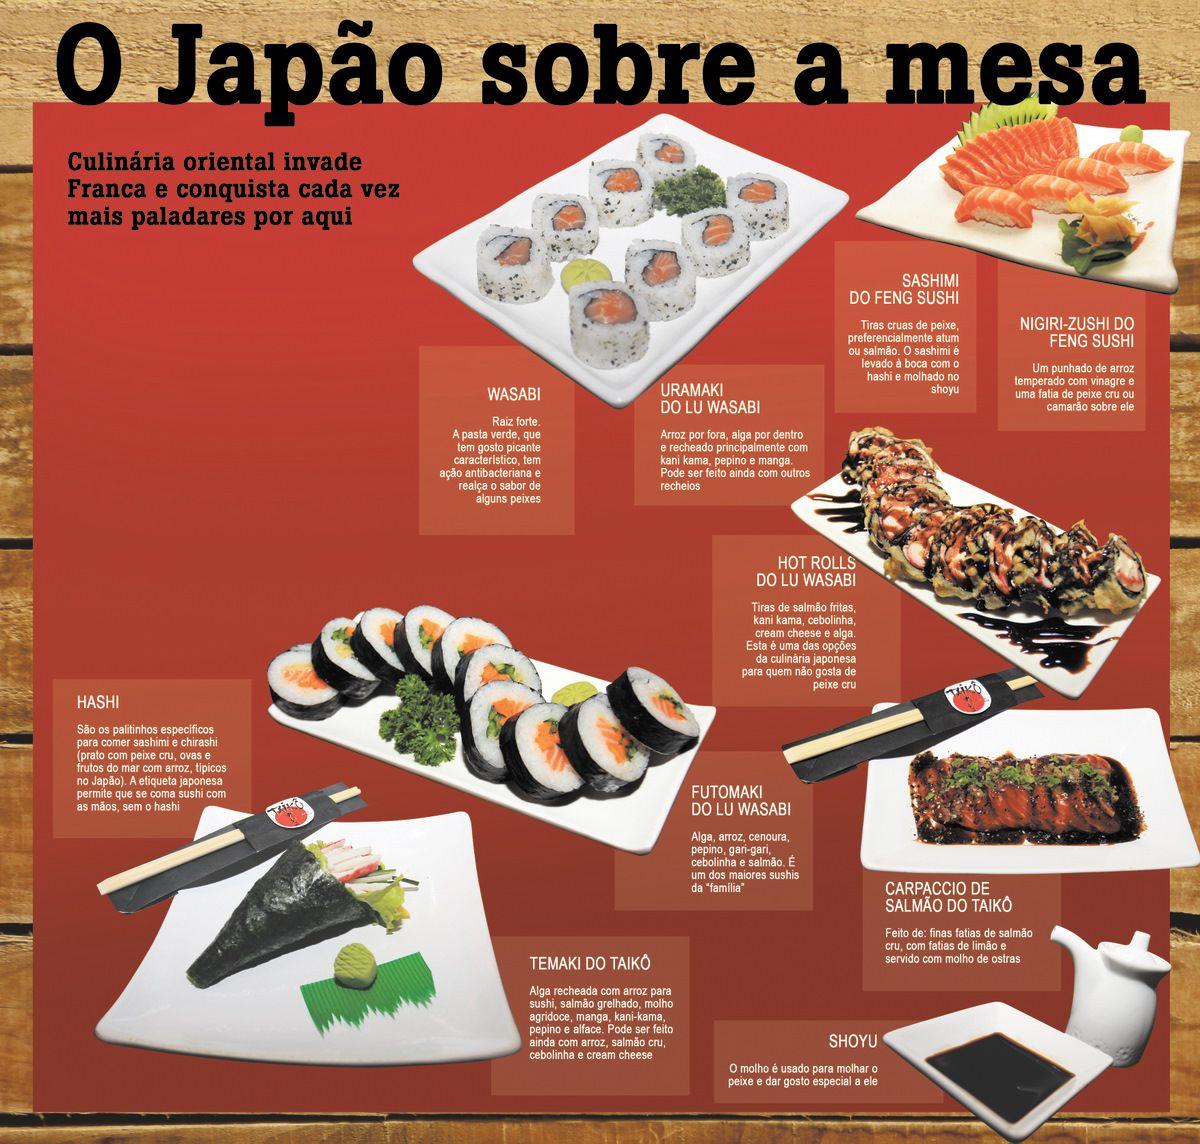 Muito Pin de KDT42 em Creative Sushi | Pinterest WC28